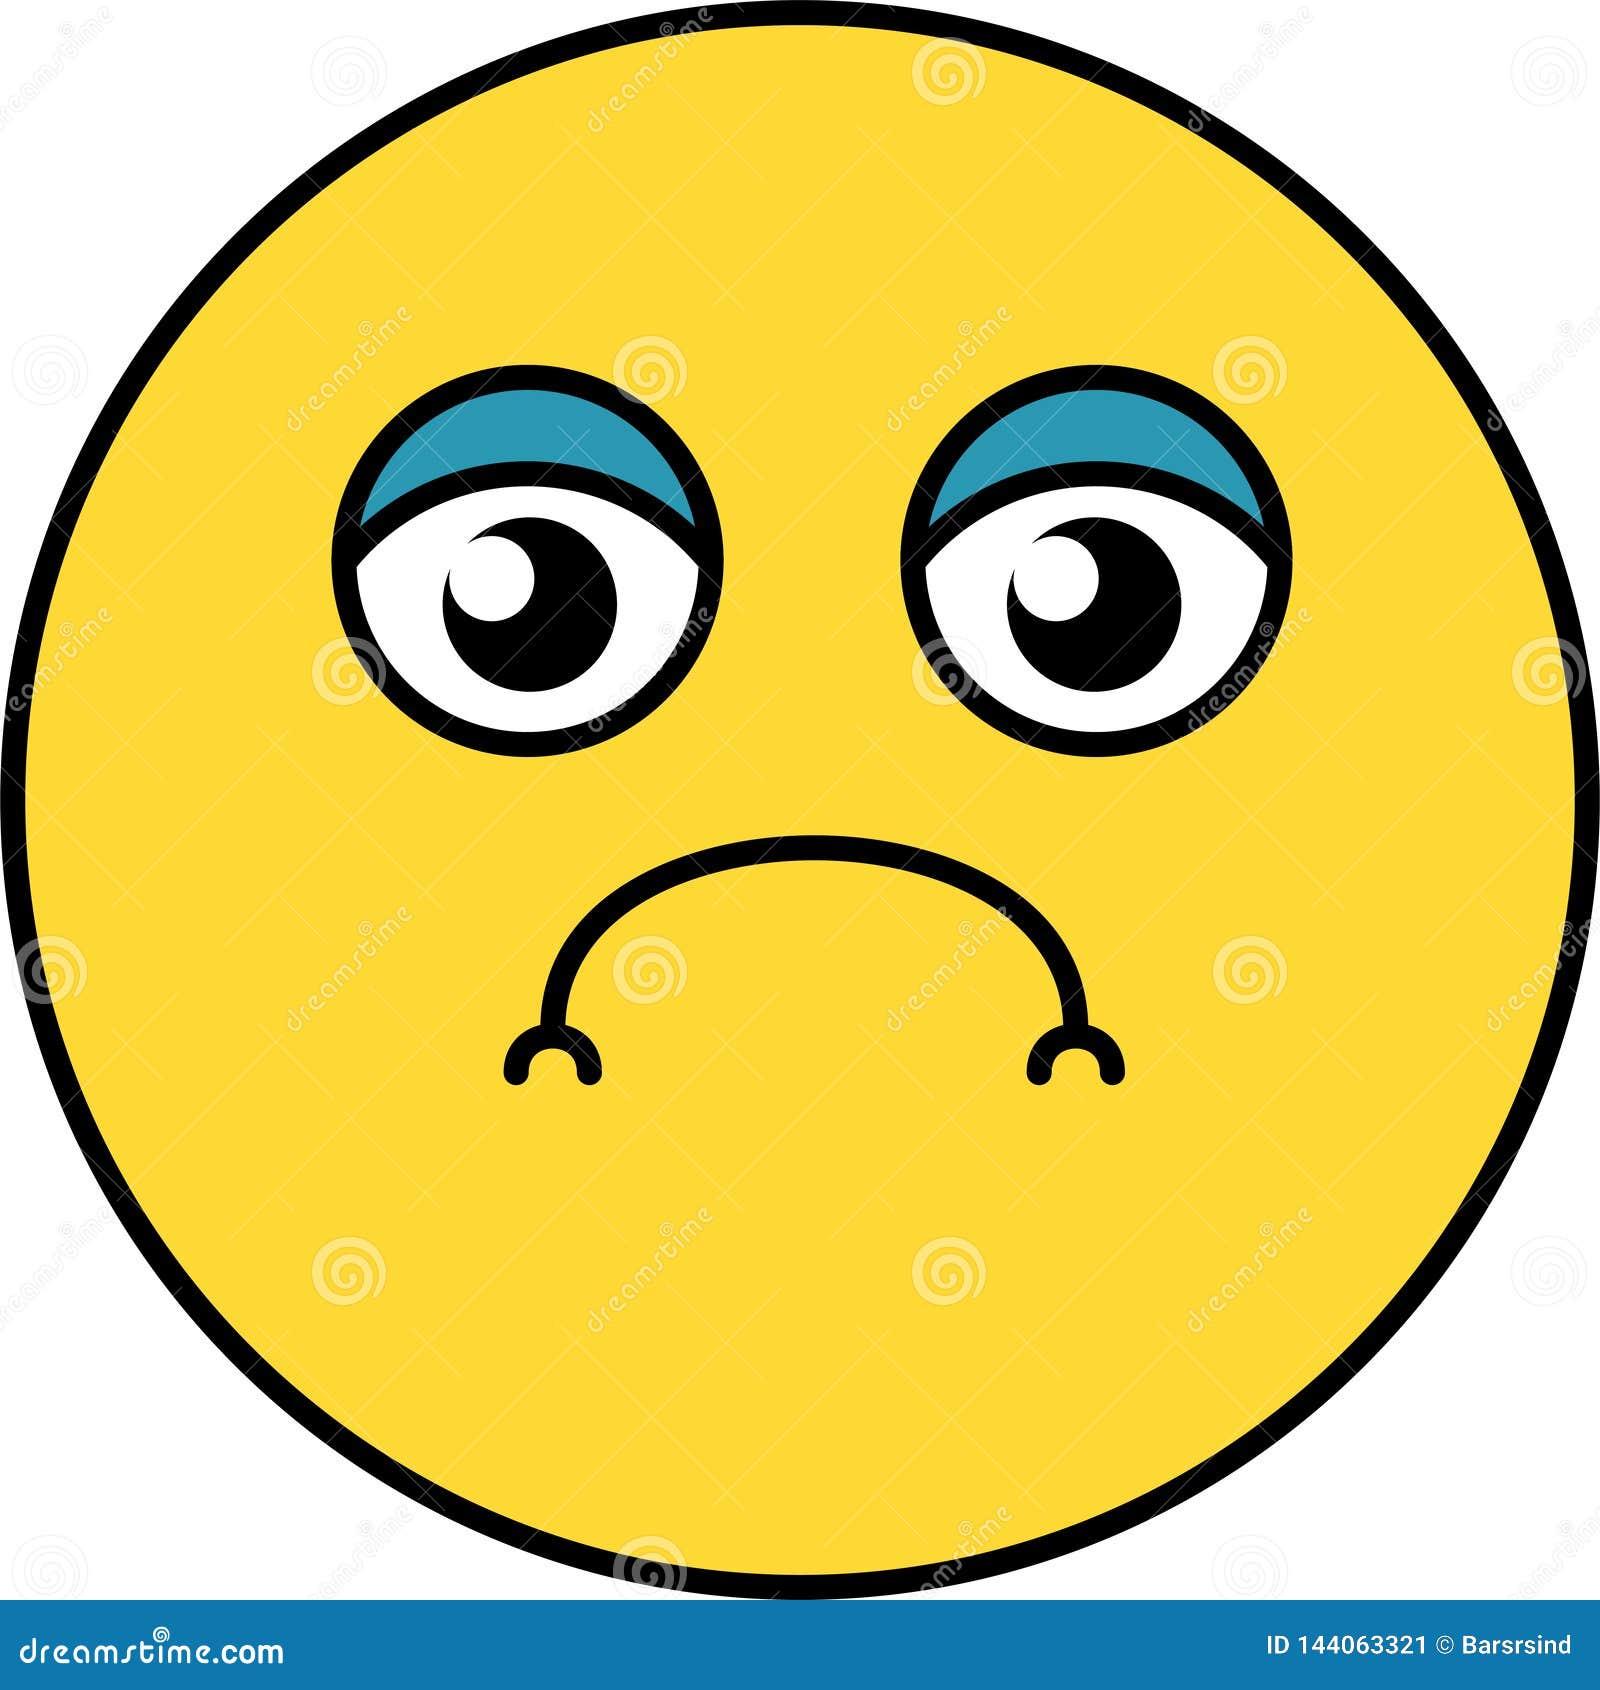 Sad Somber Emoji Illustration Stock Vector Illustration Of